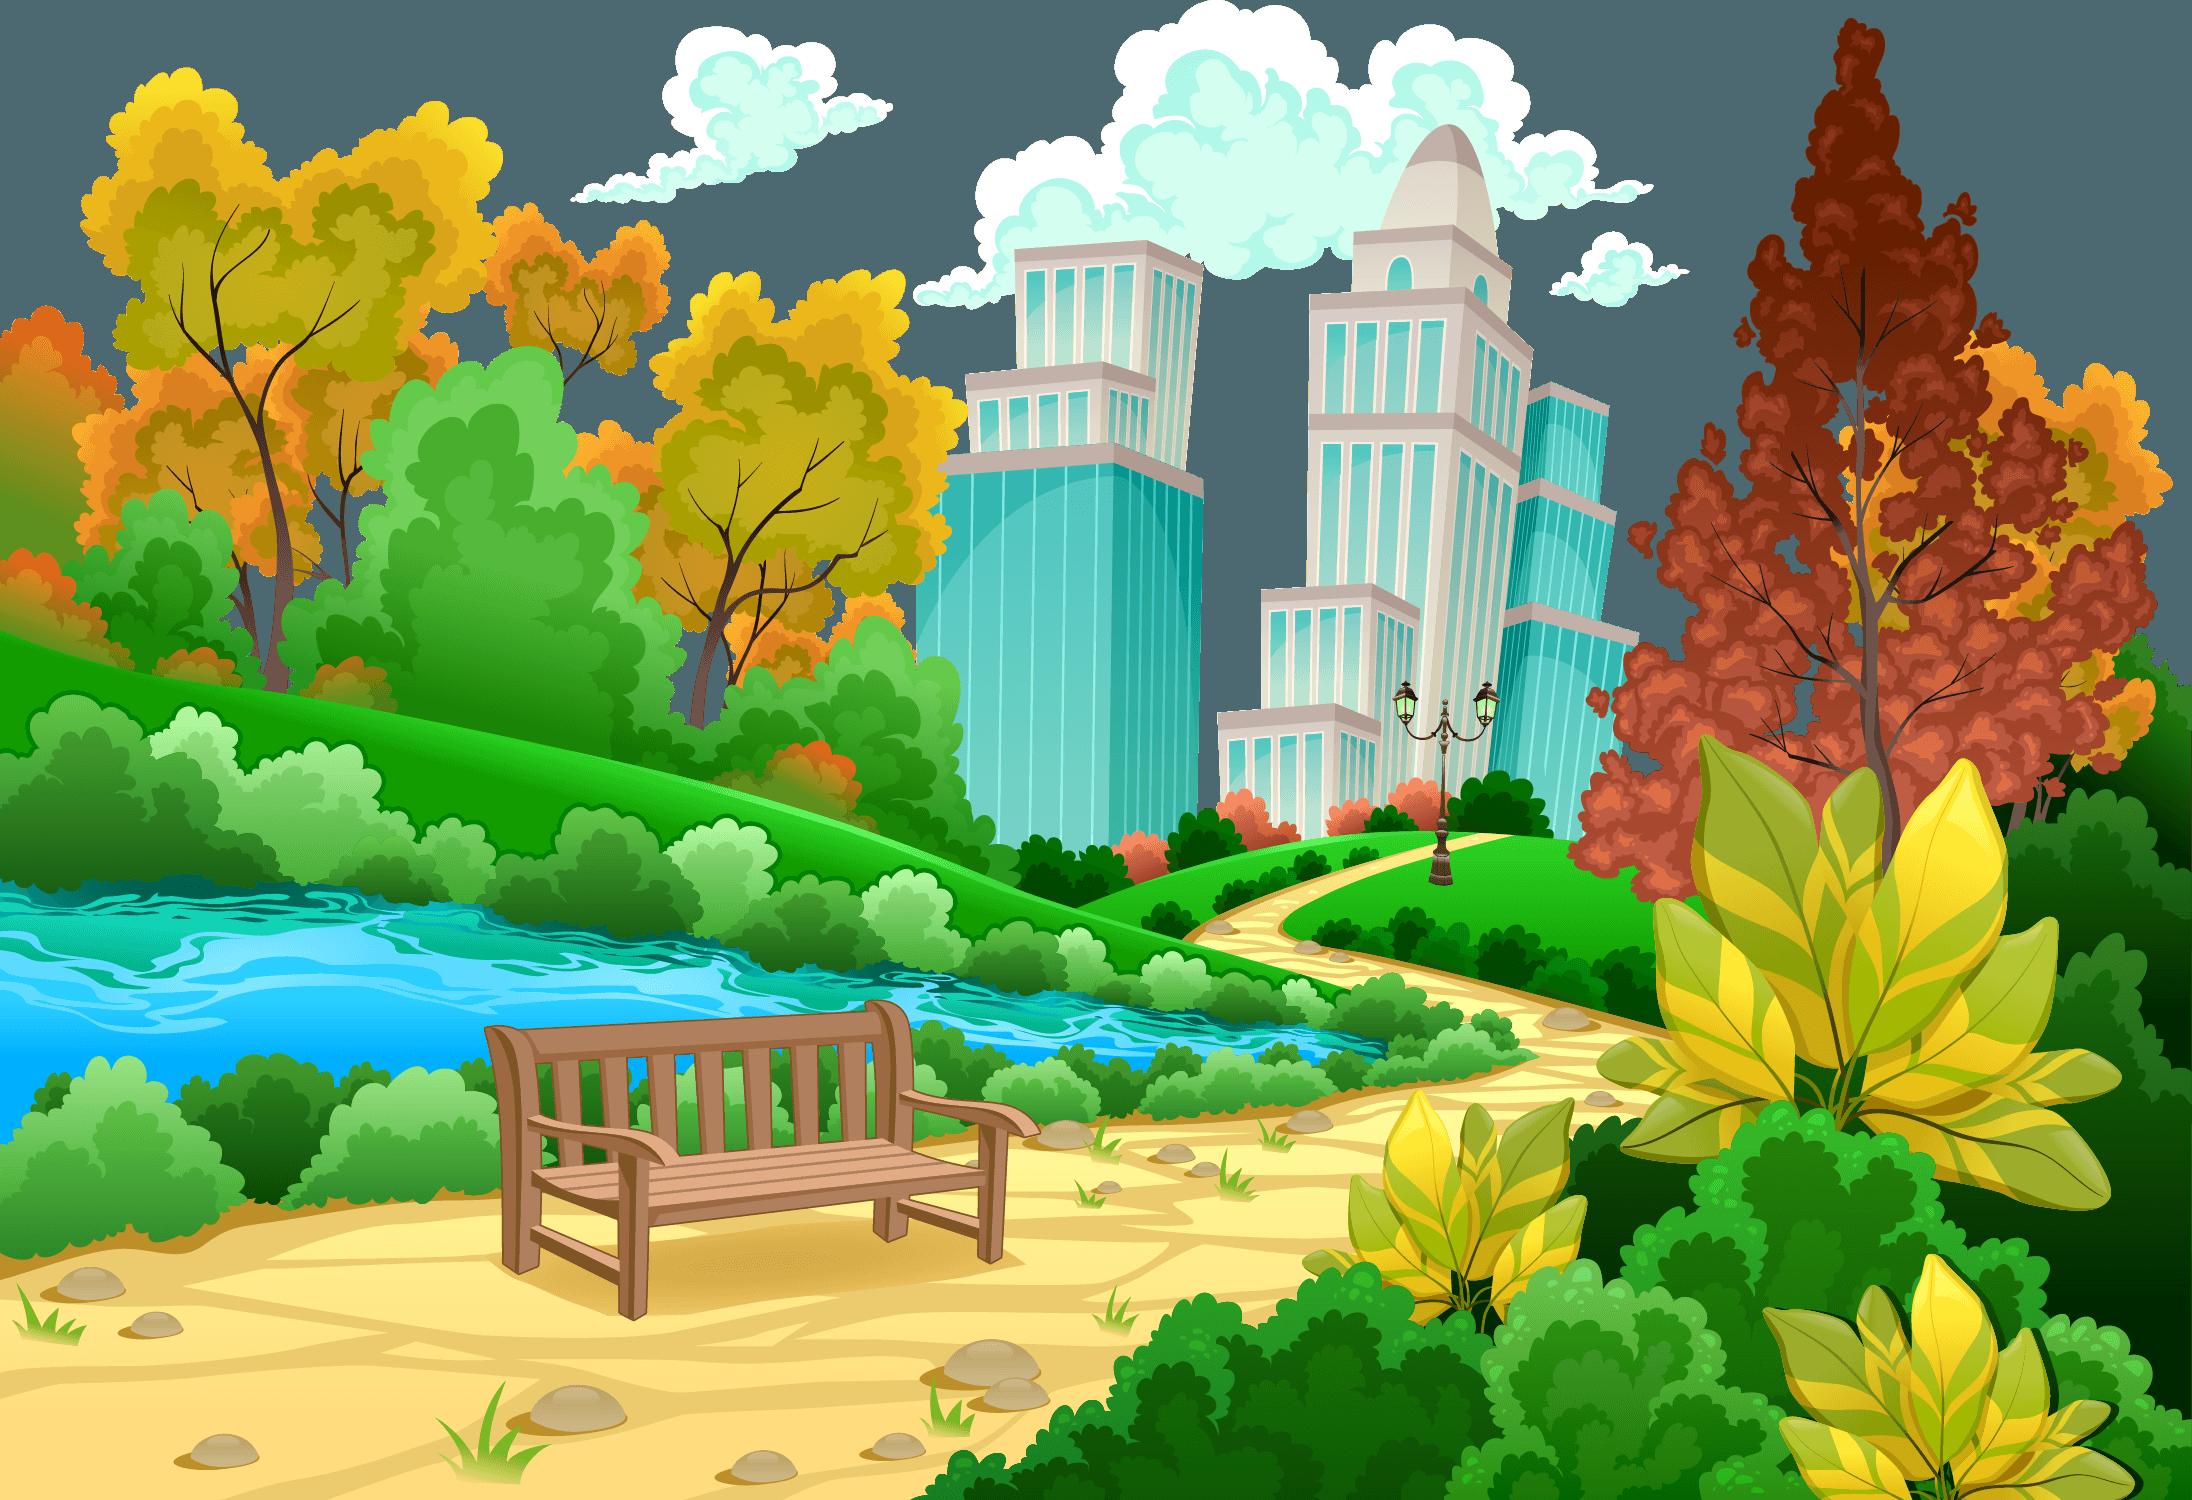 Clip Art Best Free Cartoon - Urban Scenery - HD Wallpaper